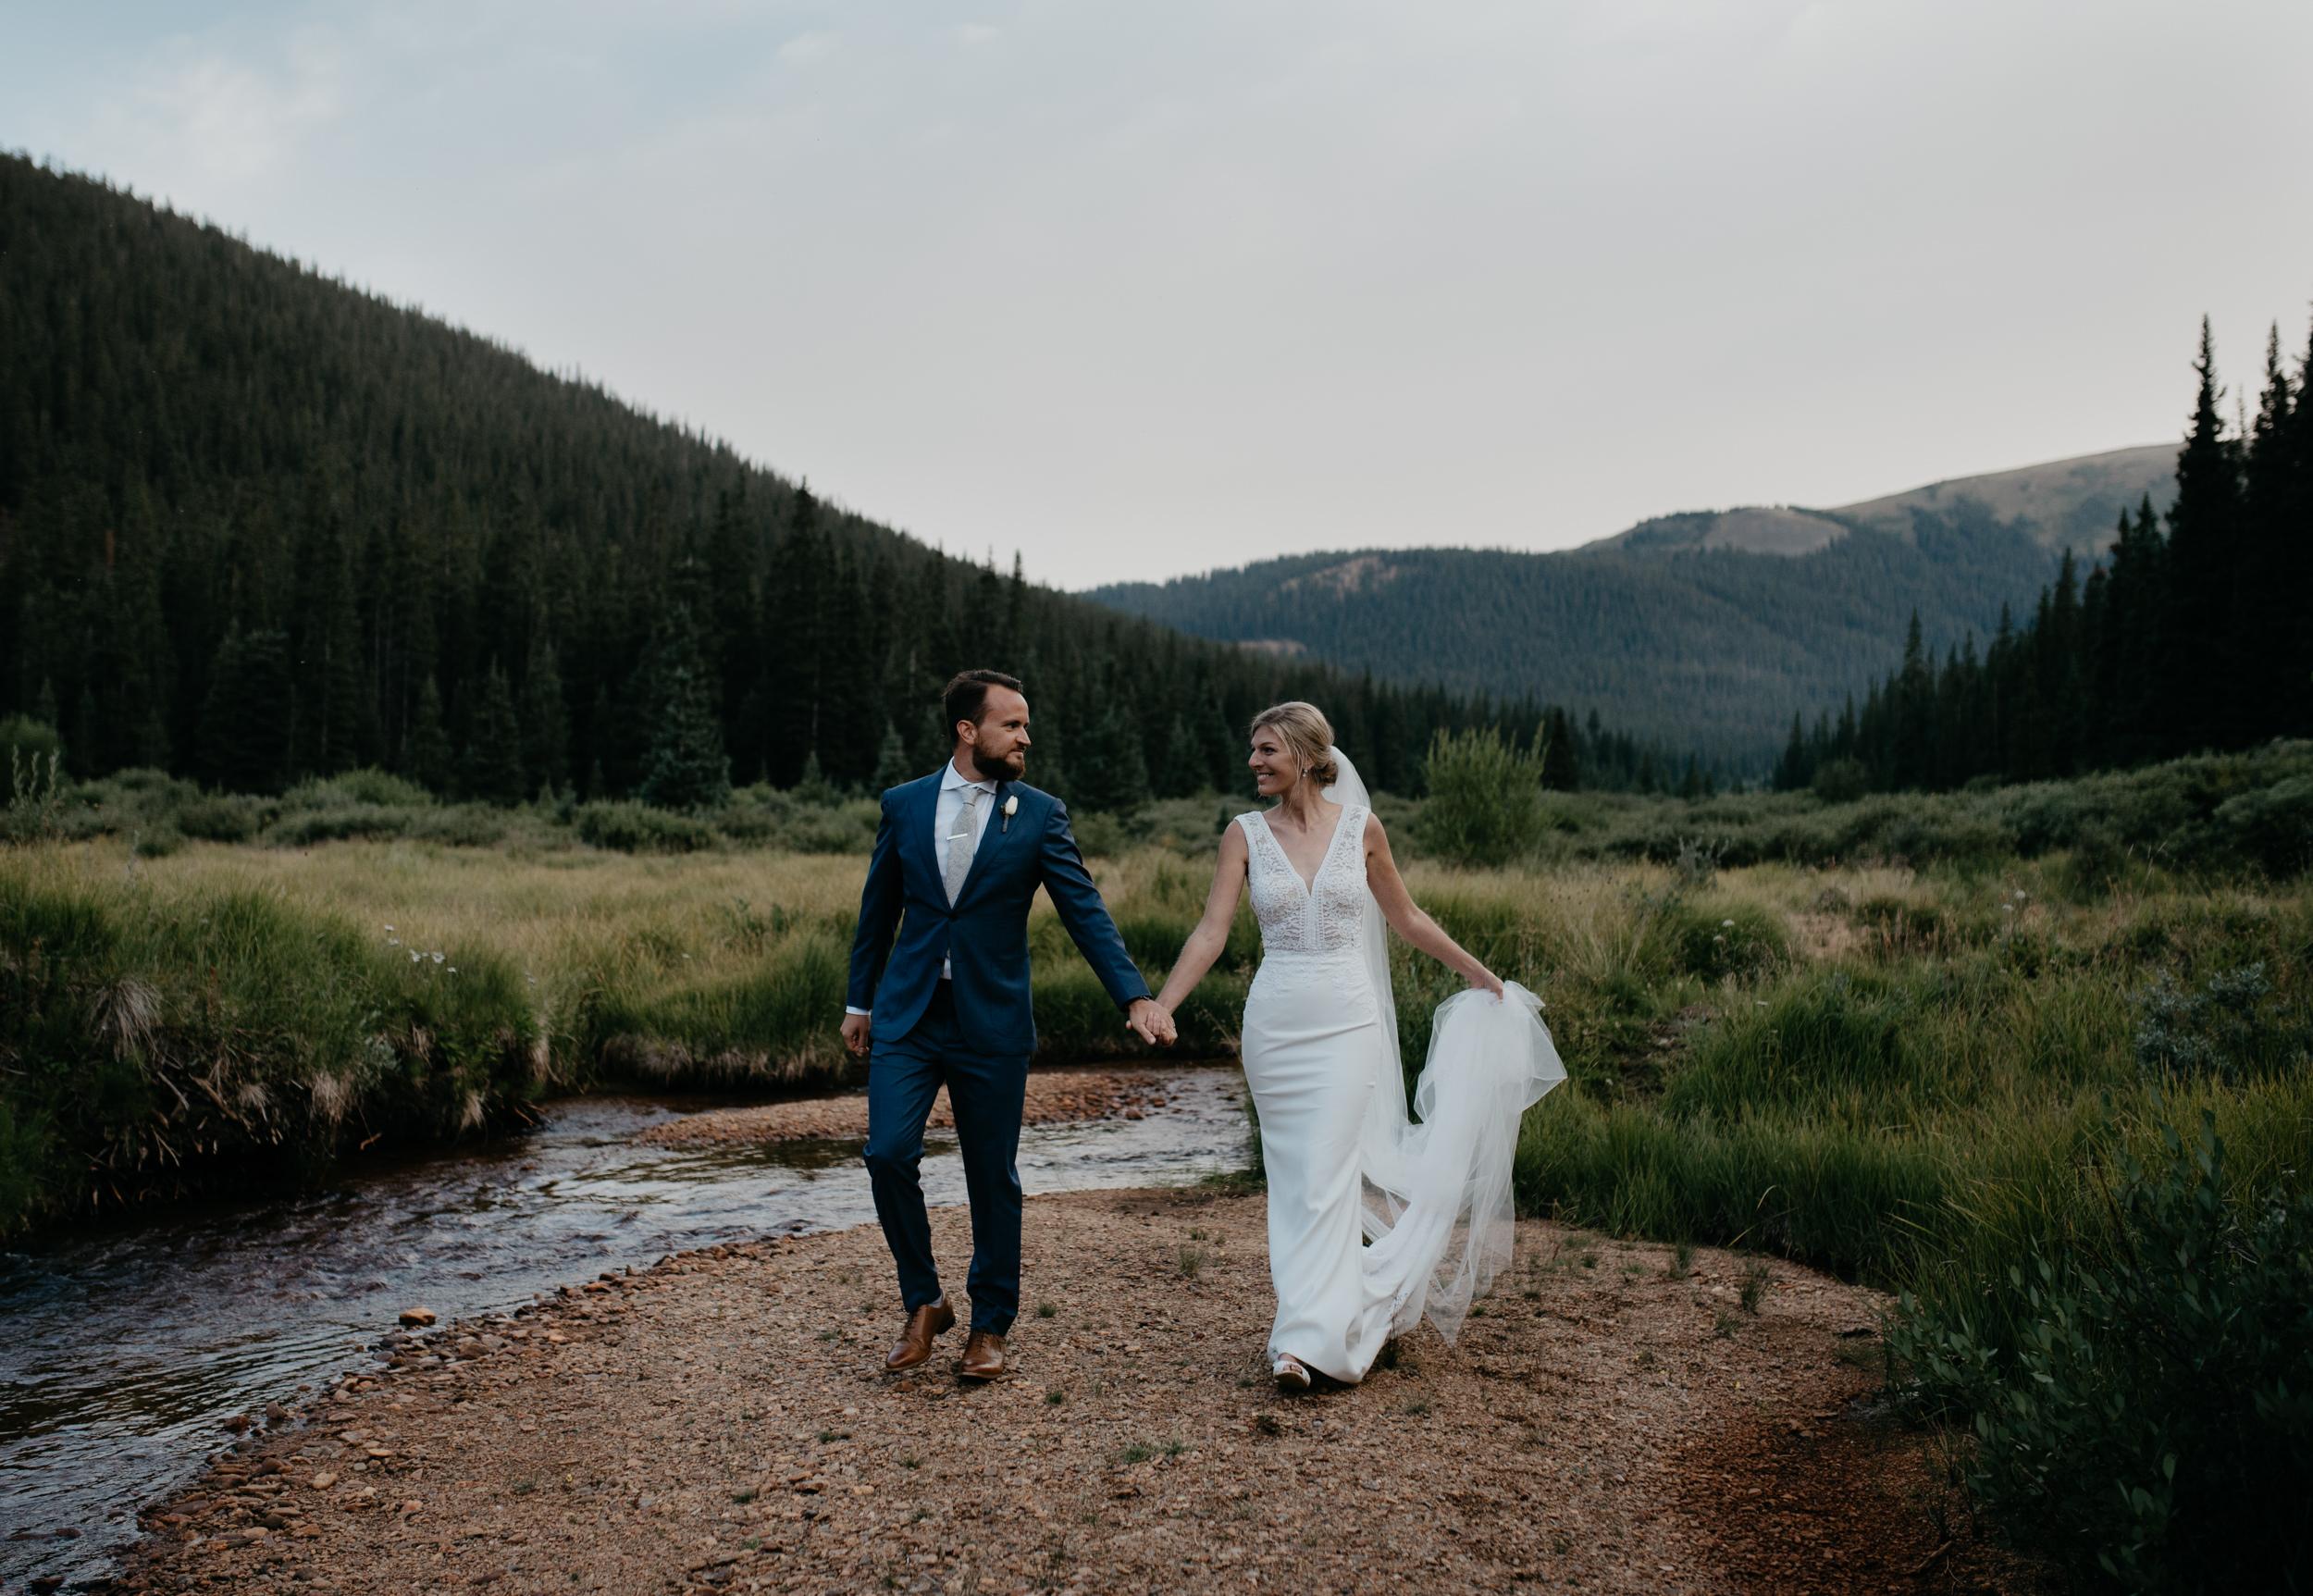 Colorado intimate wedding photographer. Elopement at Guanella Pass in Colorado.